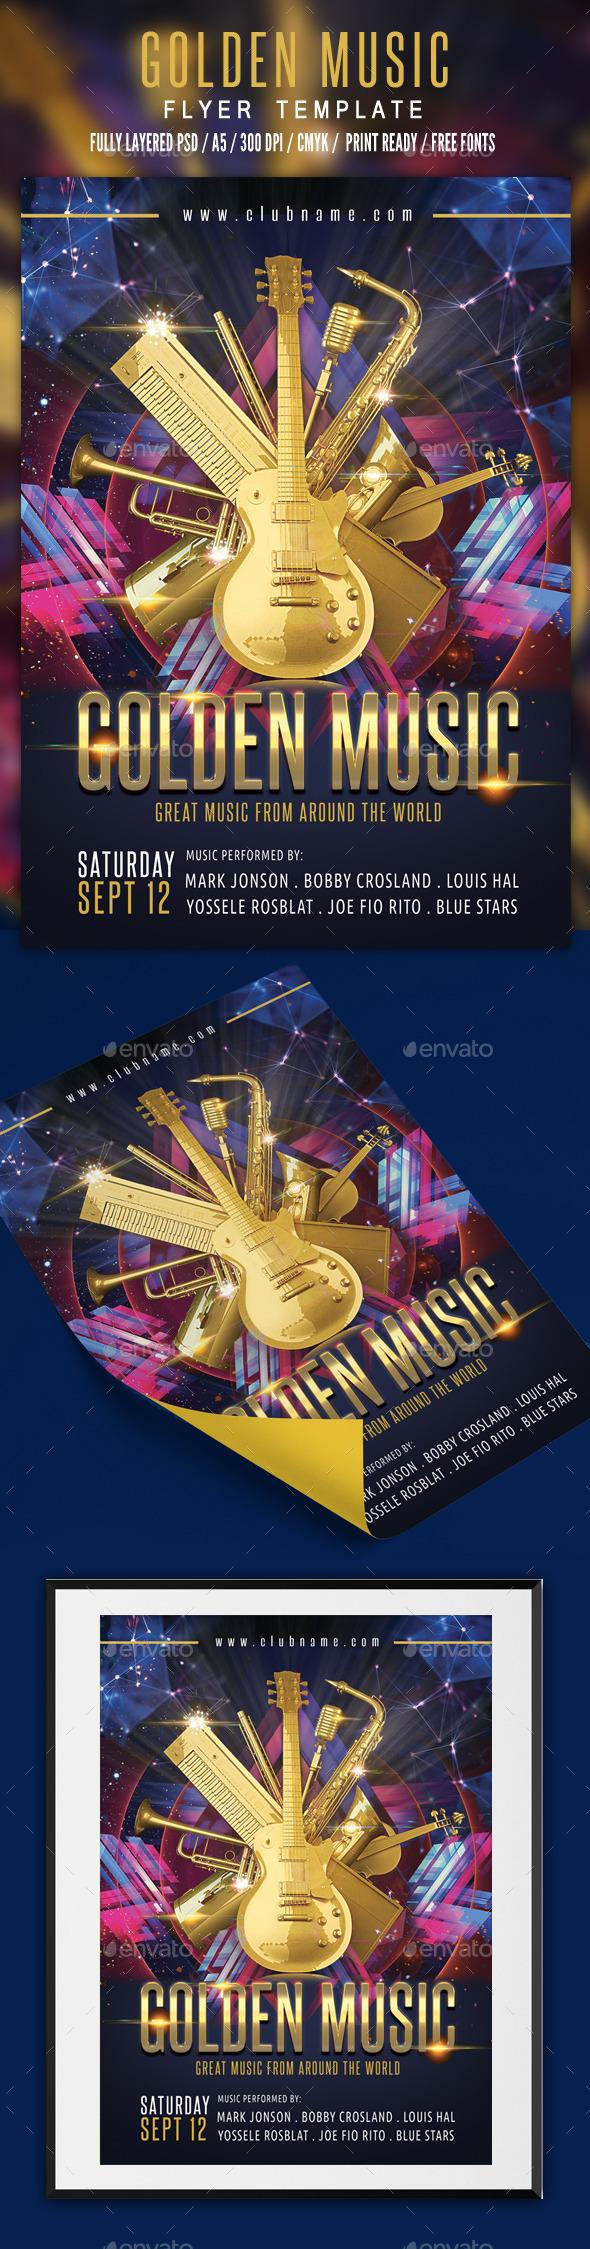 Golden Music Flyer Template - Events Flyers